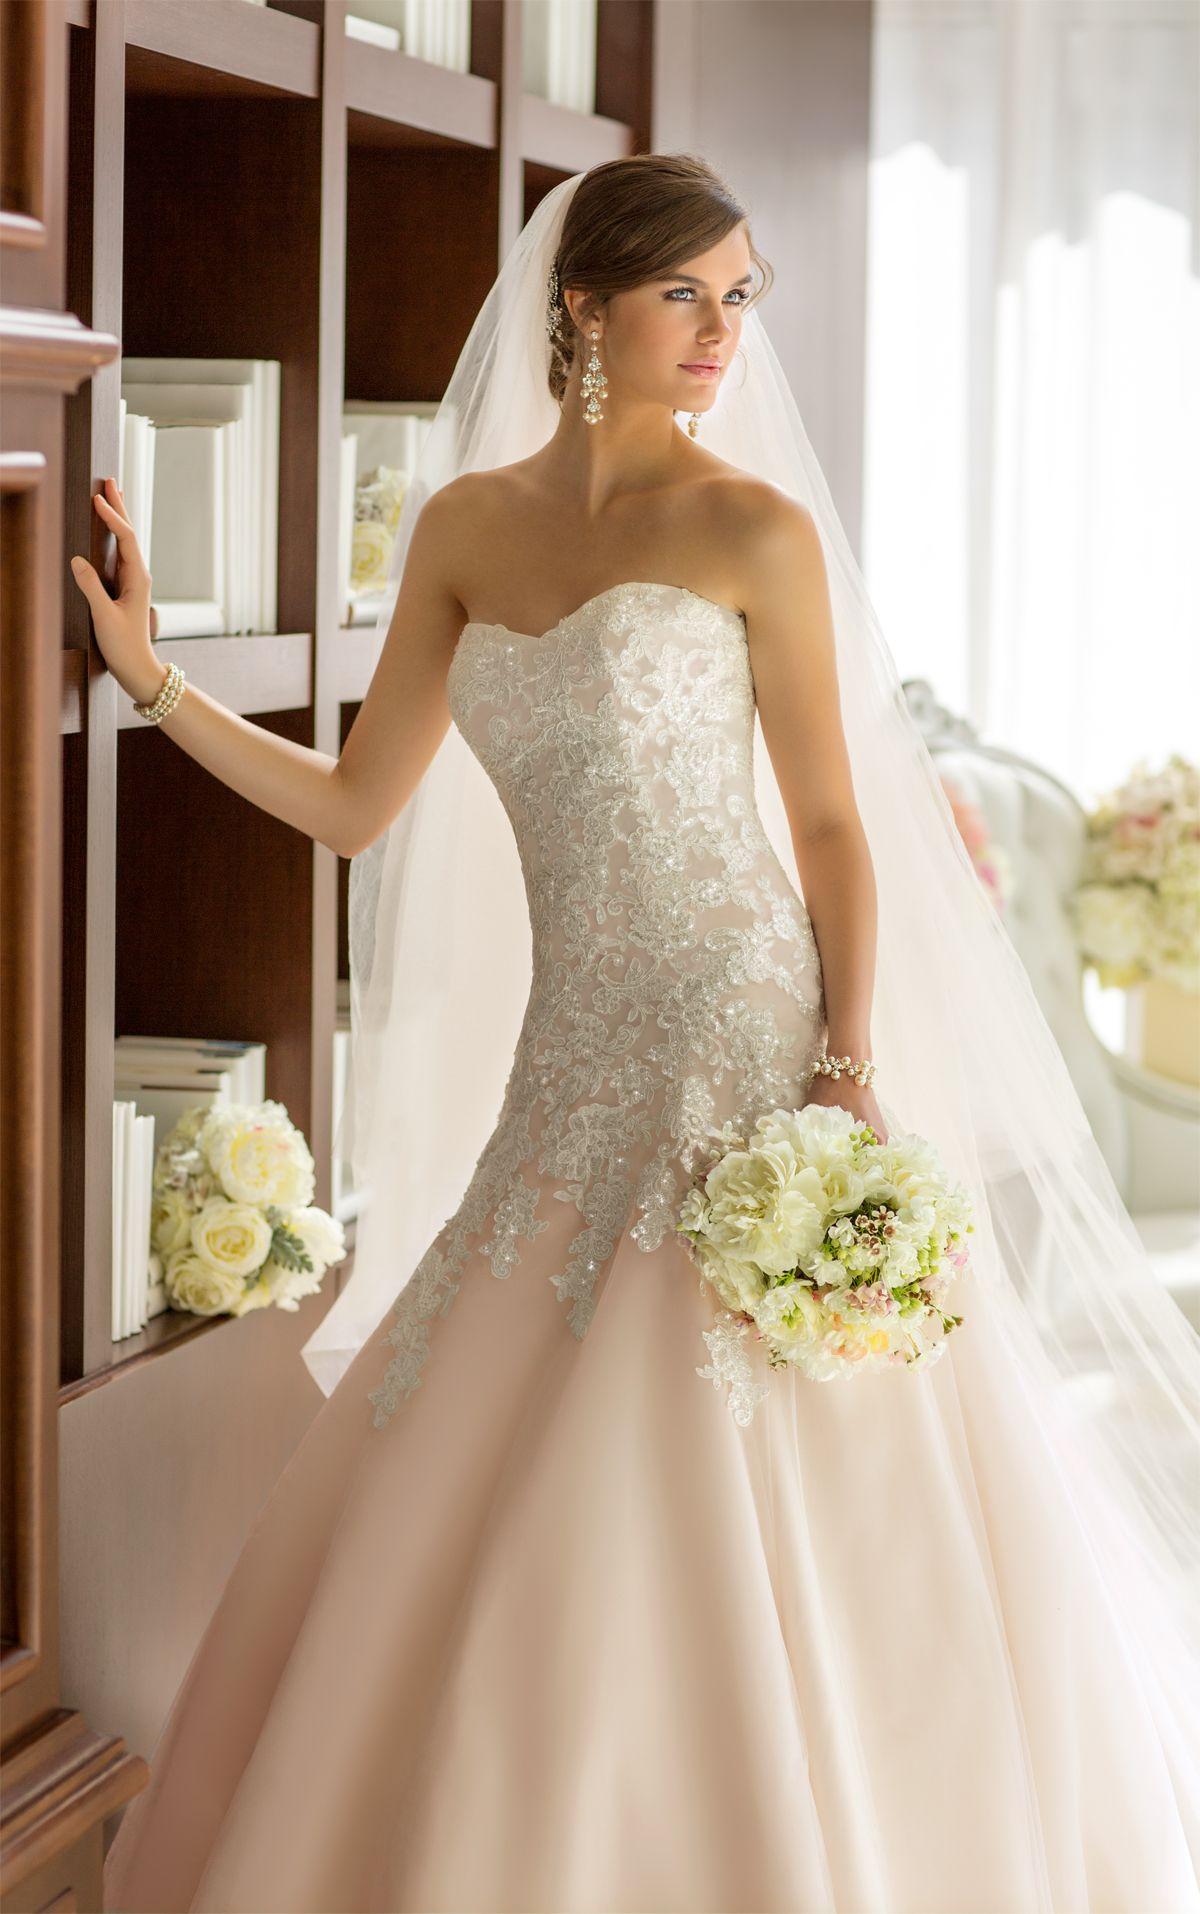 Flattering wedding dresses for plus size  This elegant Essense of Australia beaded wedding dress features